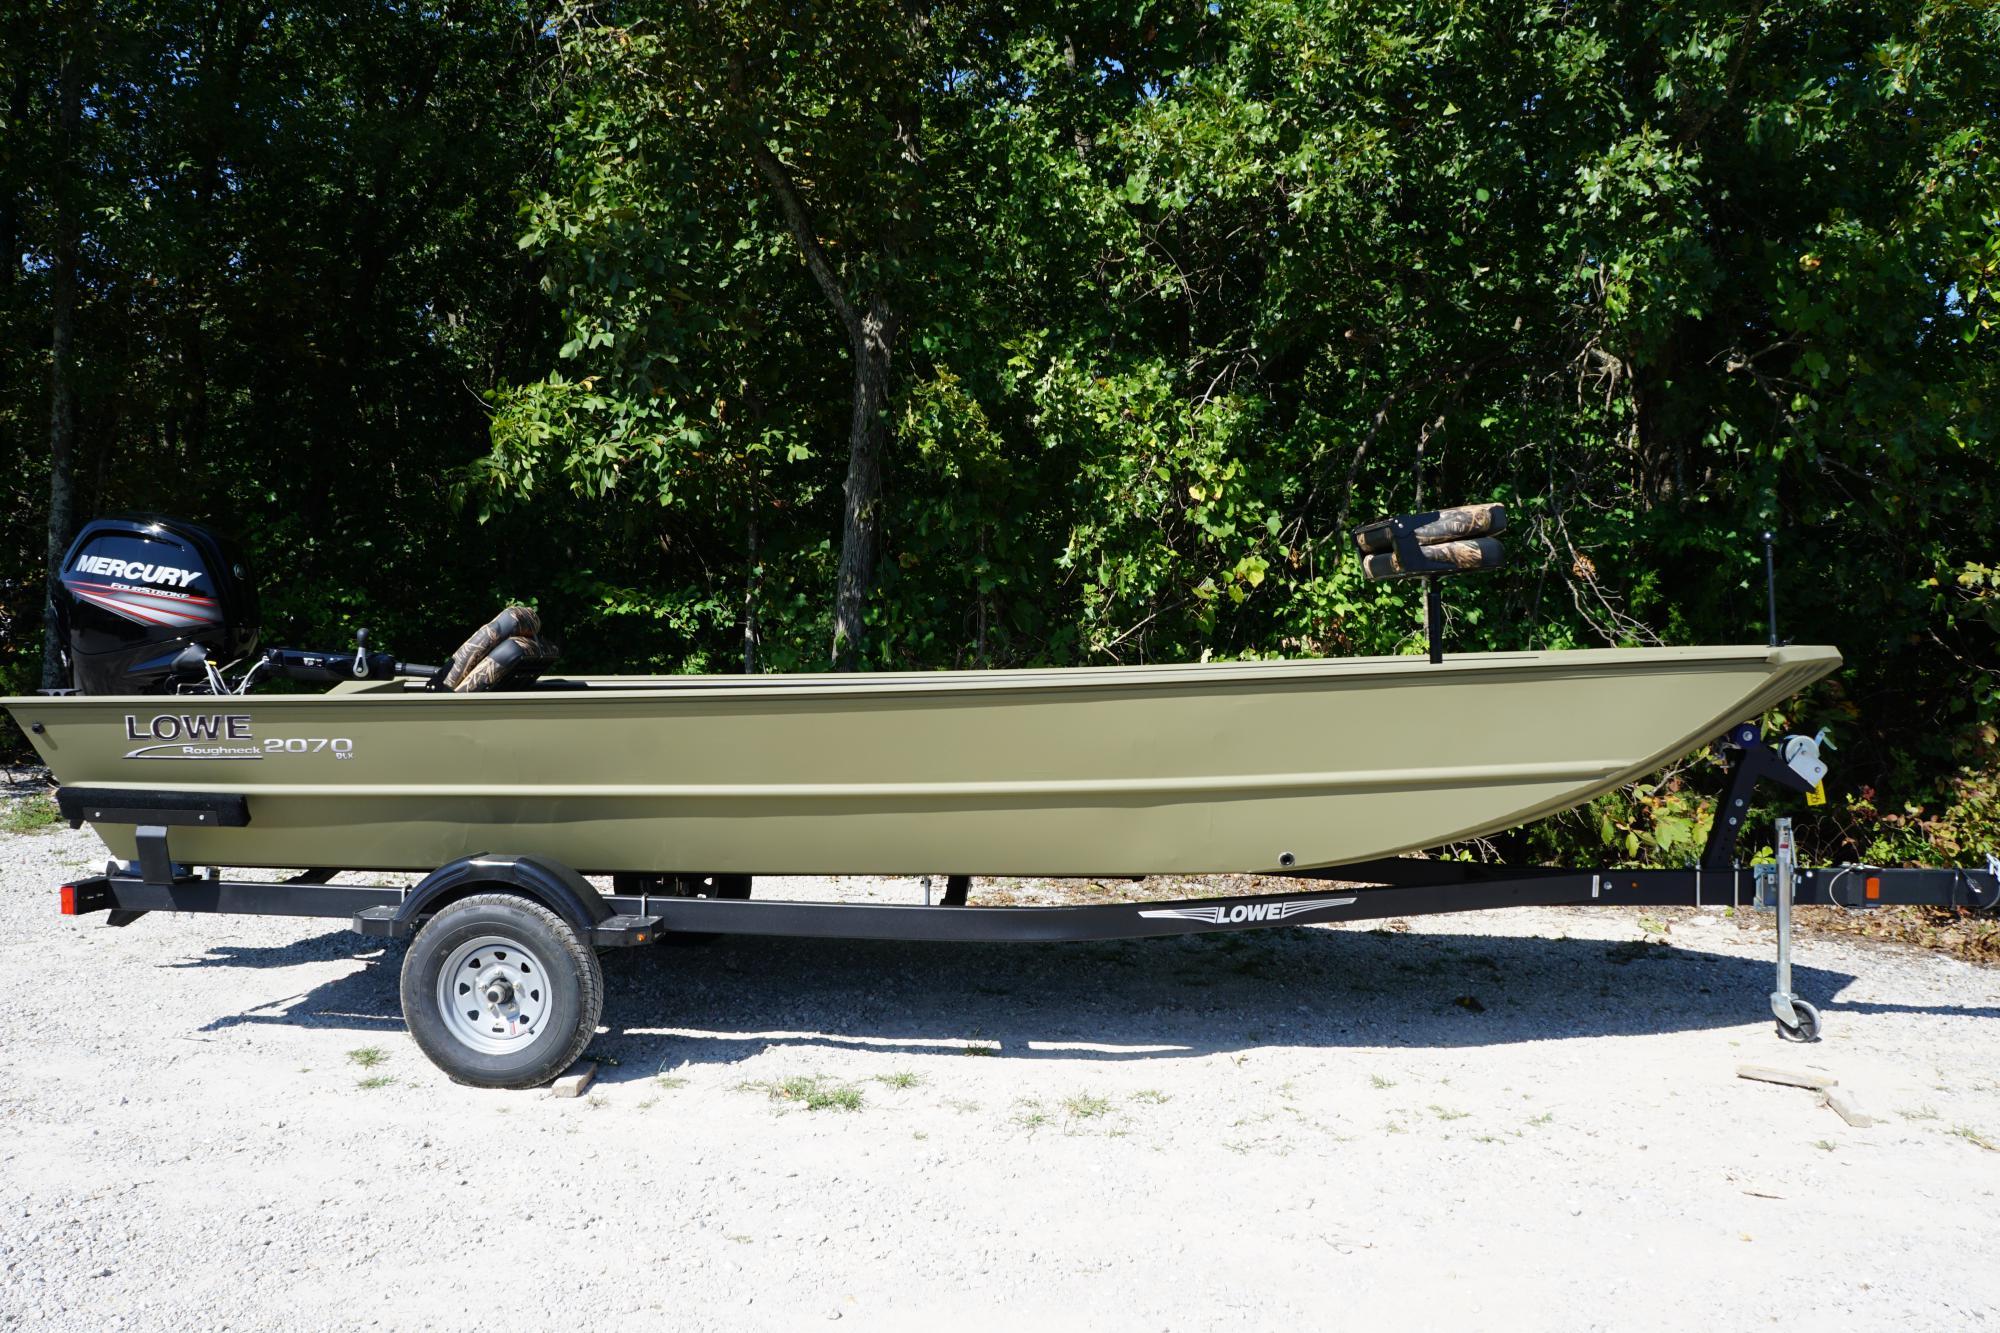 roughneck 2070 cc lowe boats - HD2000×1333